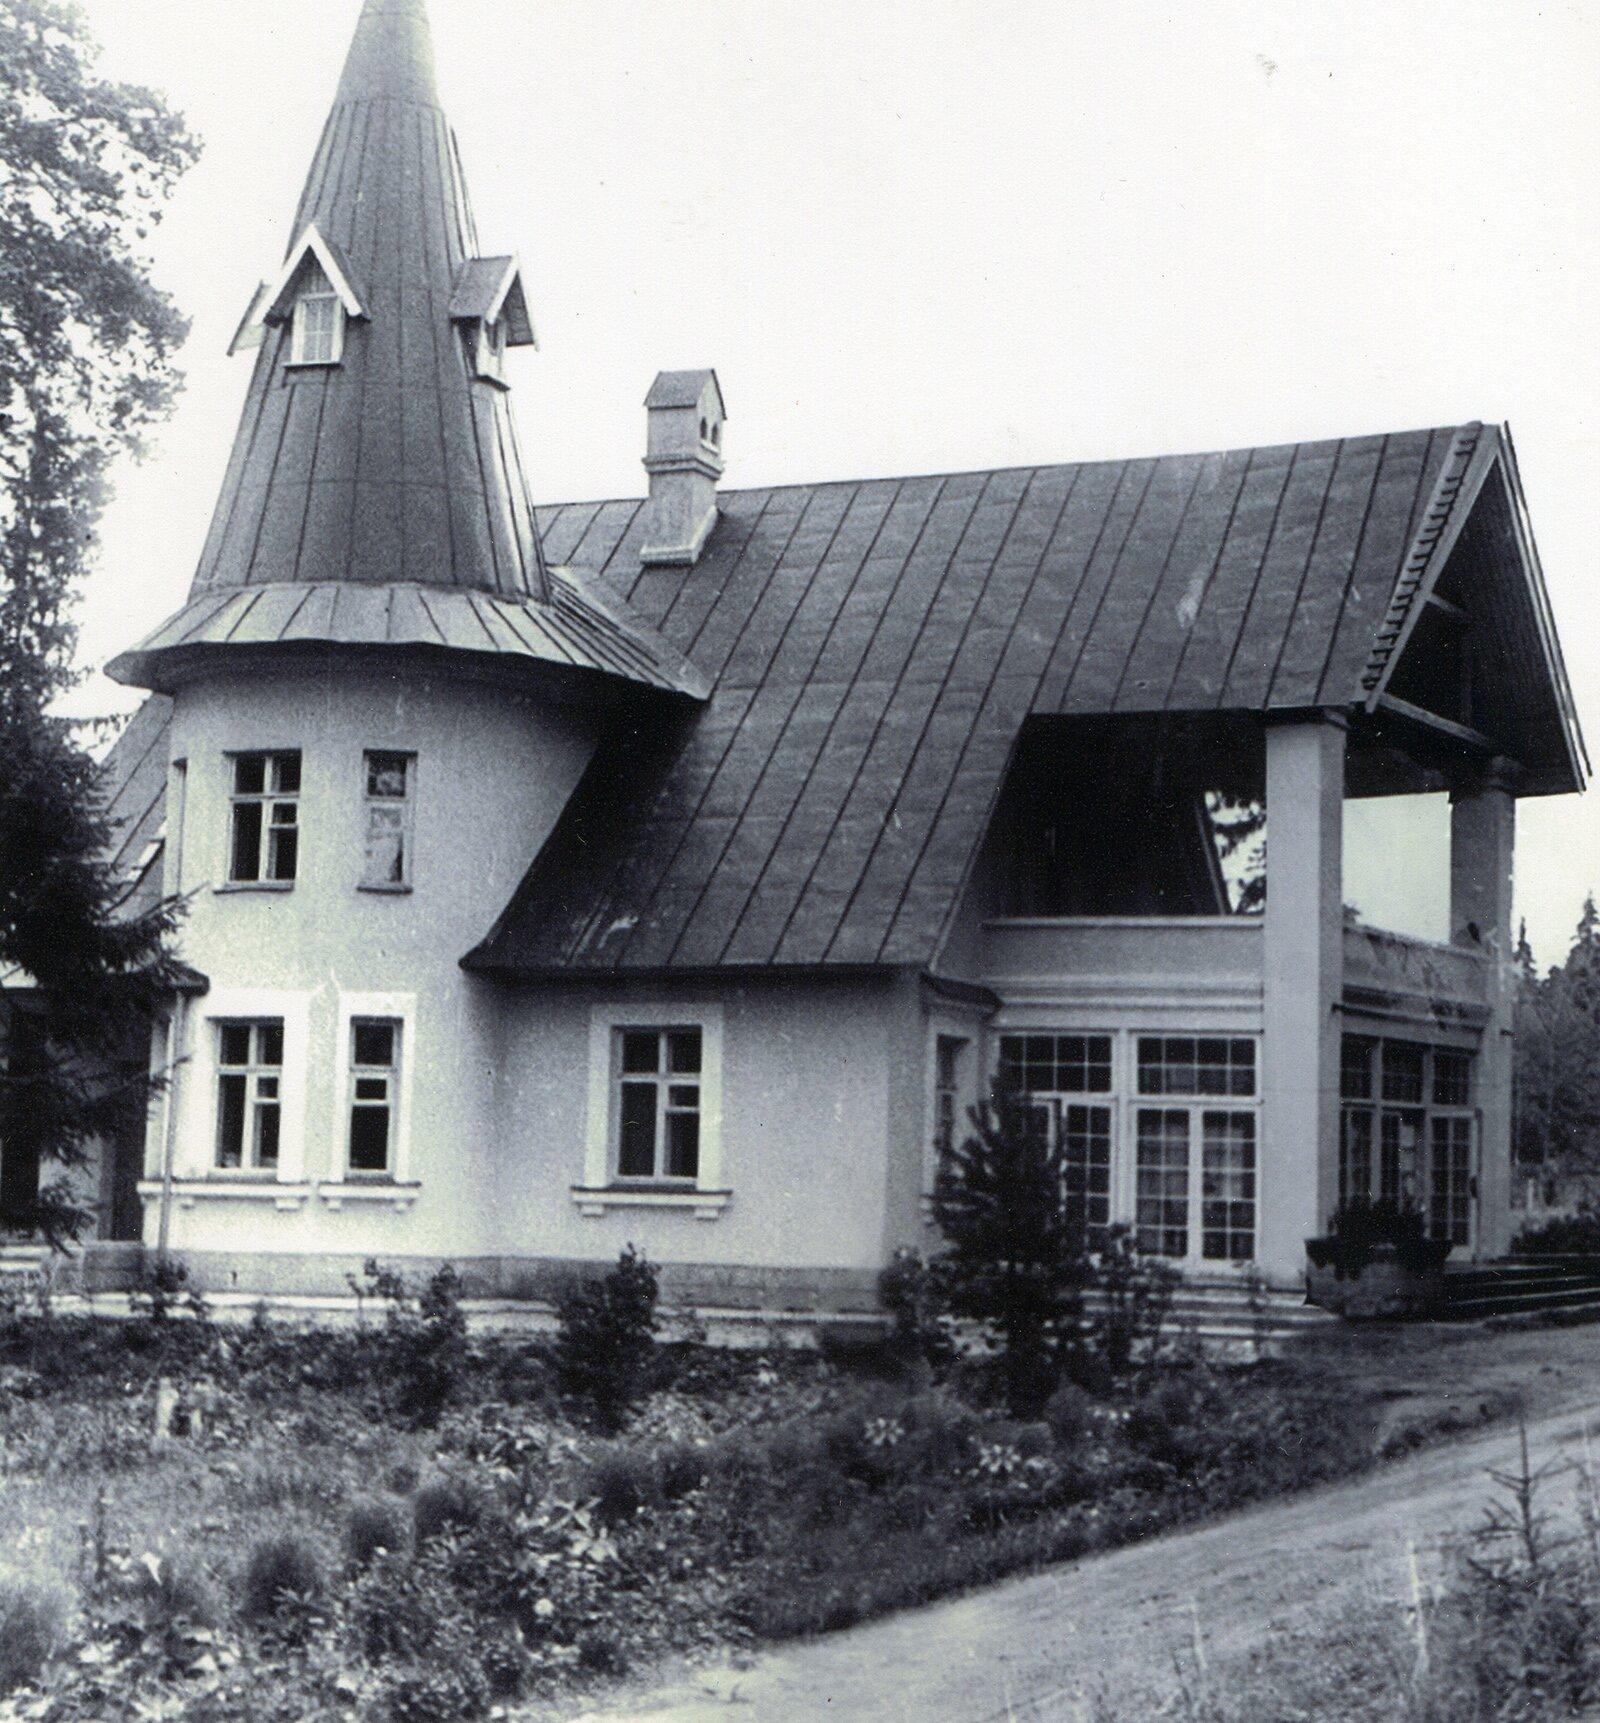 Дача Семена Лавочкина в поселке Крюково. Вторая половина 1950-х годов. Музей Зеленограда